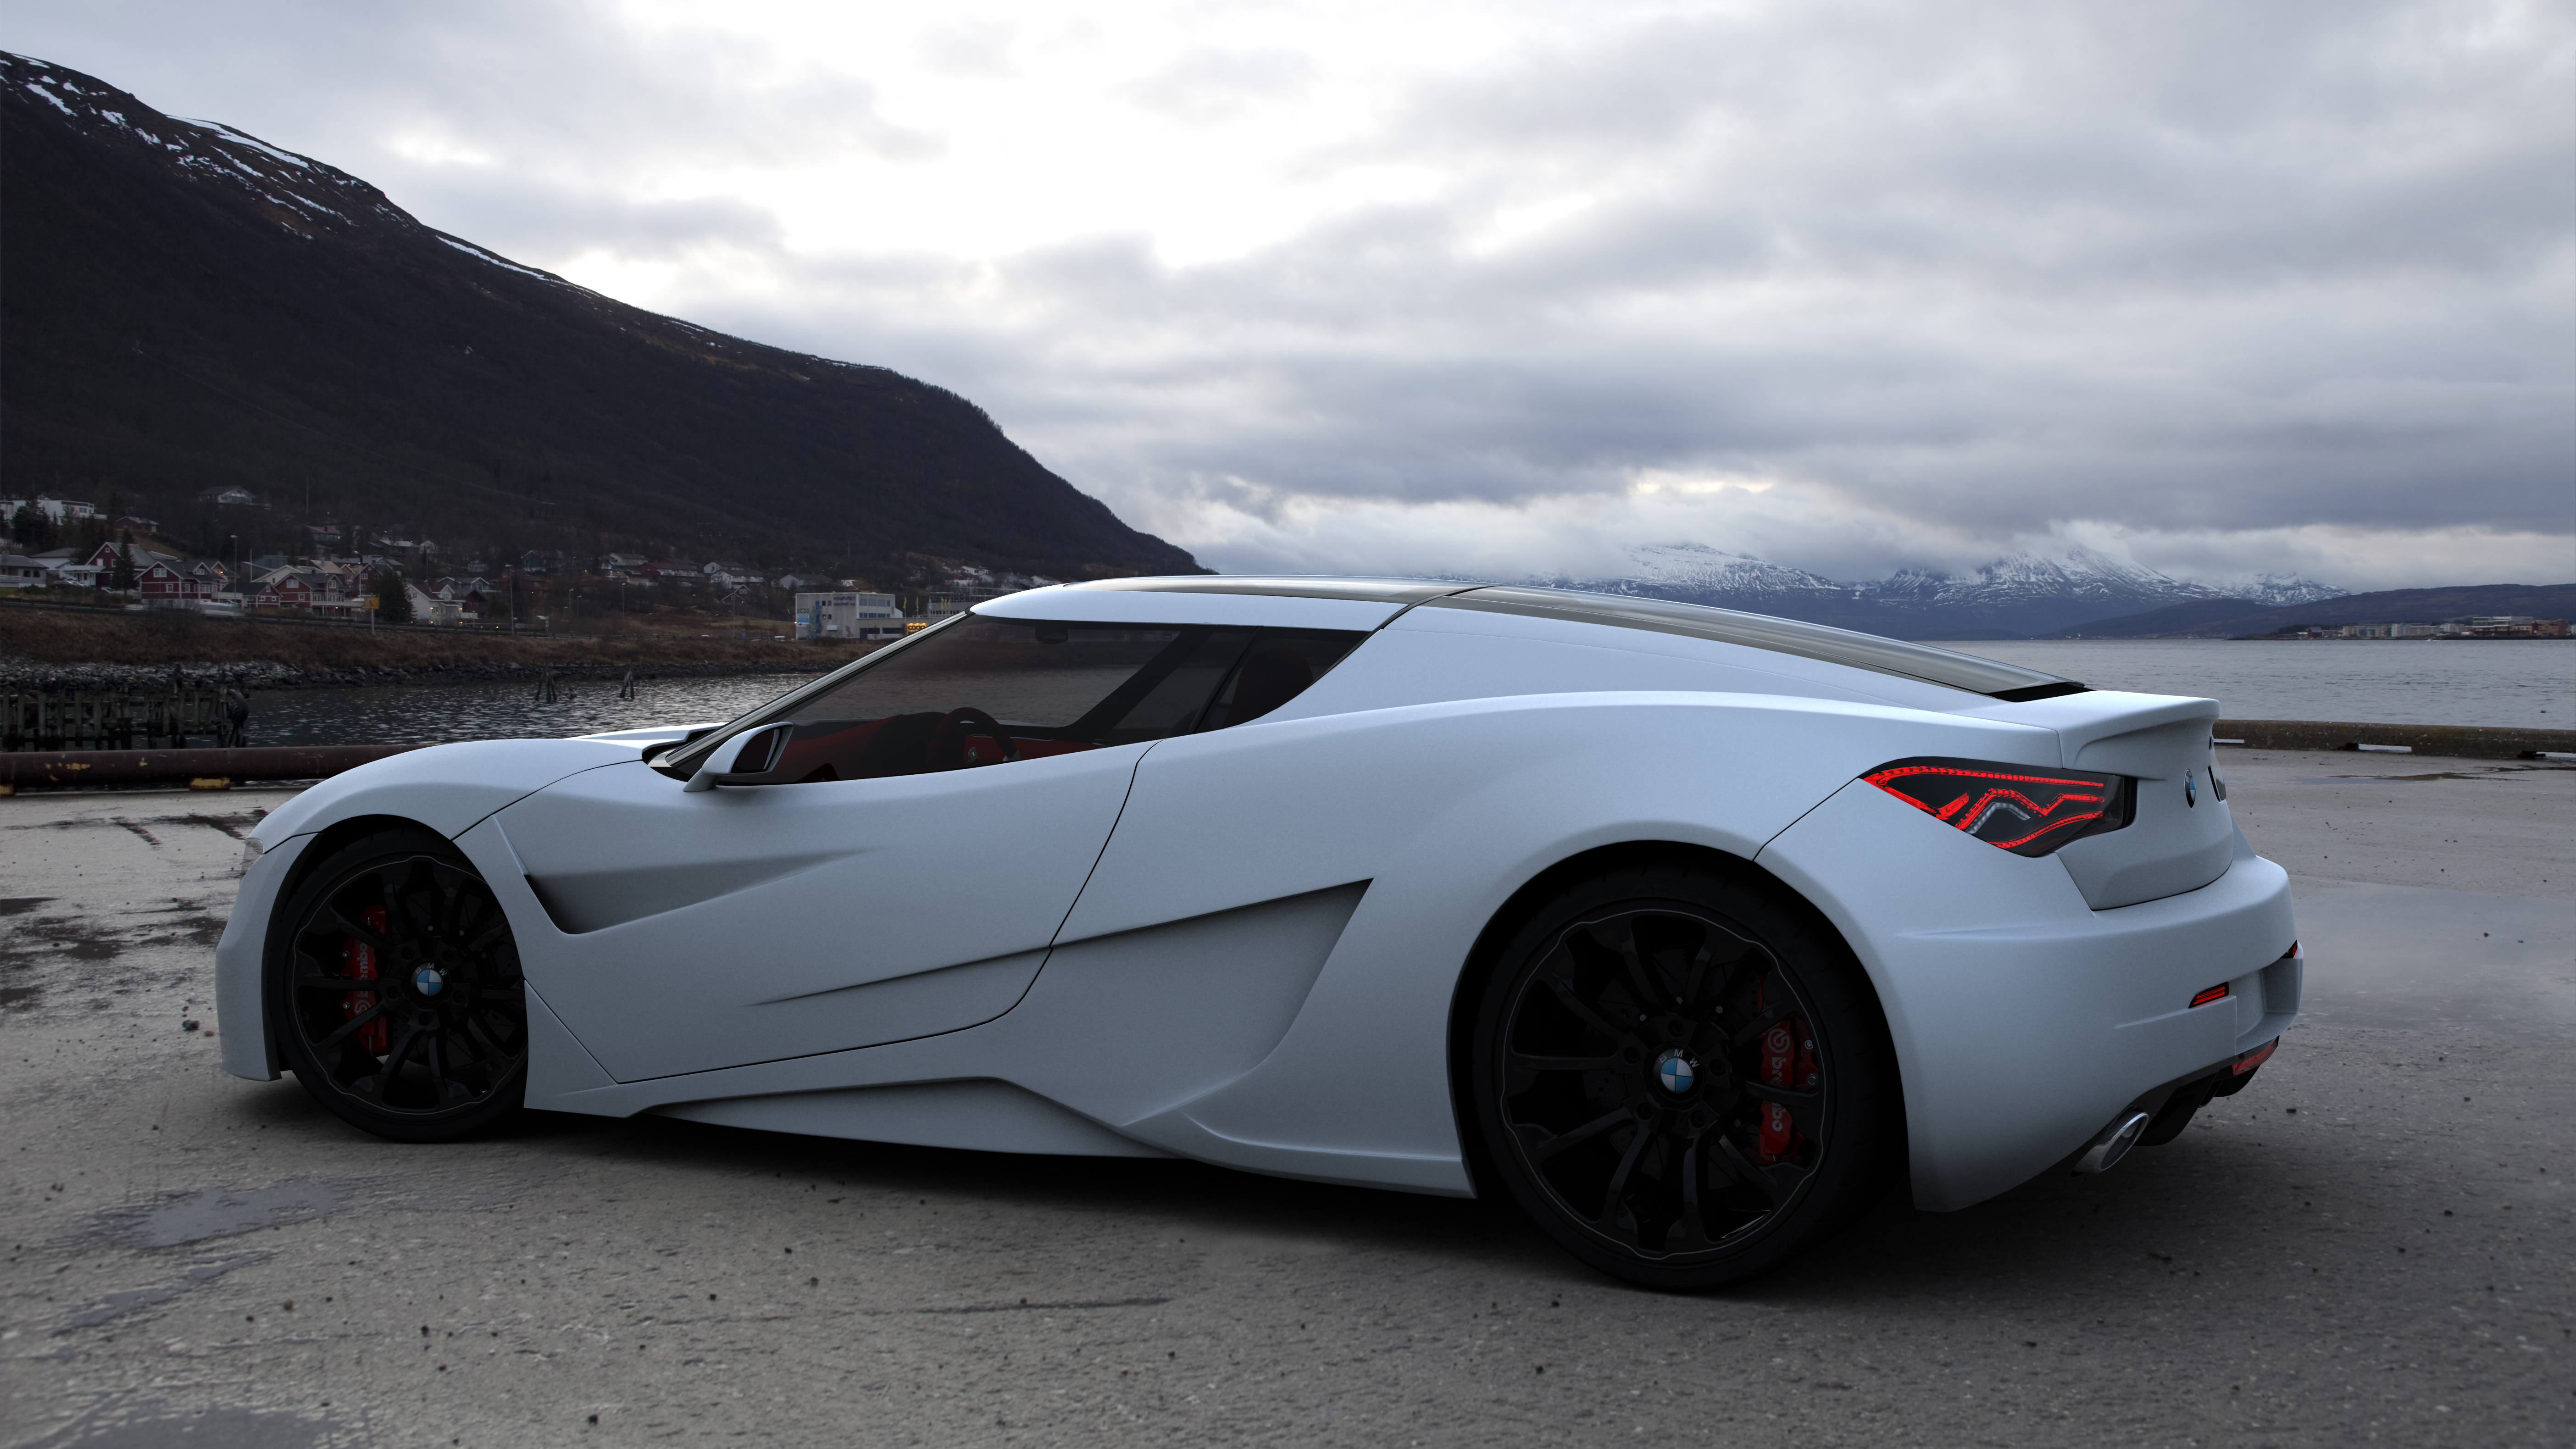 BMW GT Concept M9 - Revised version of BMW GT Concept